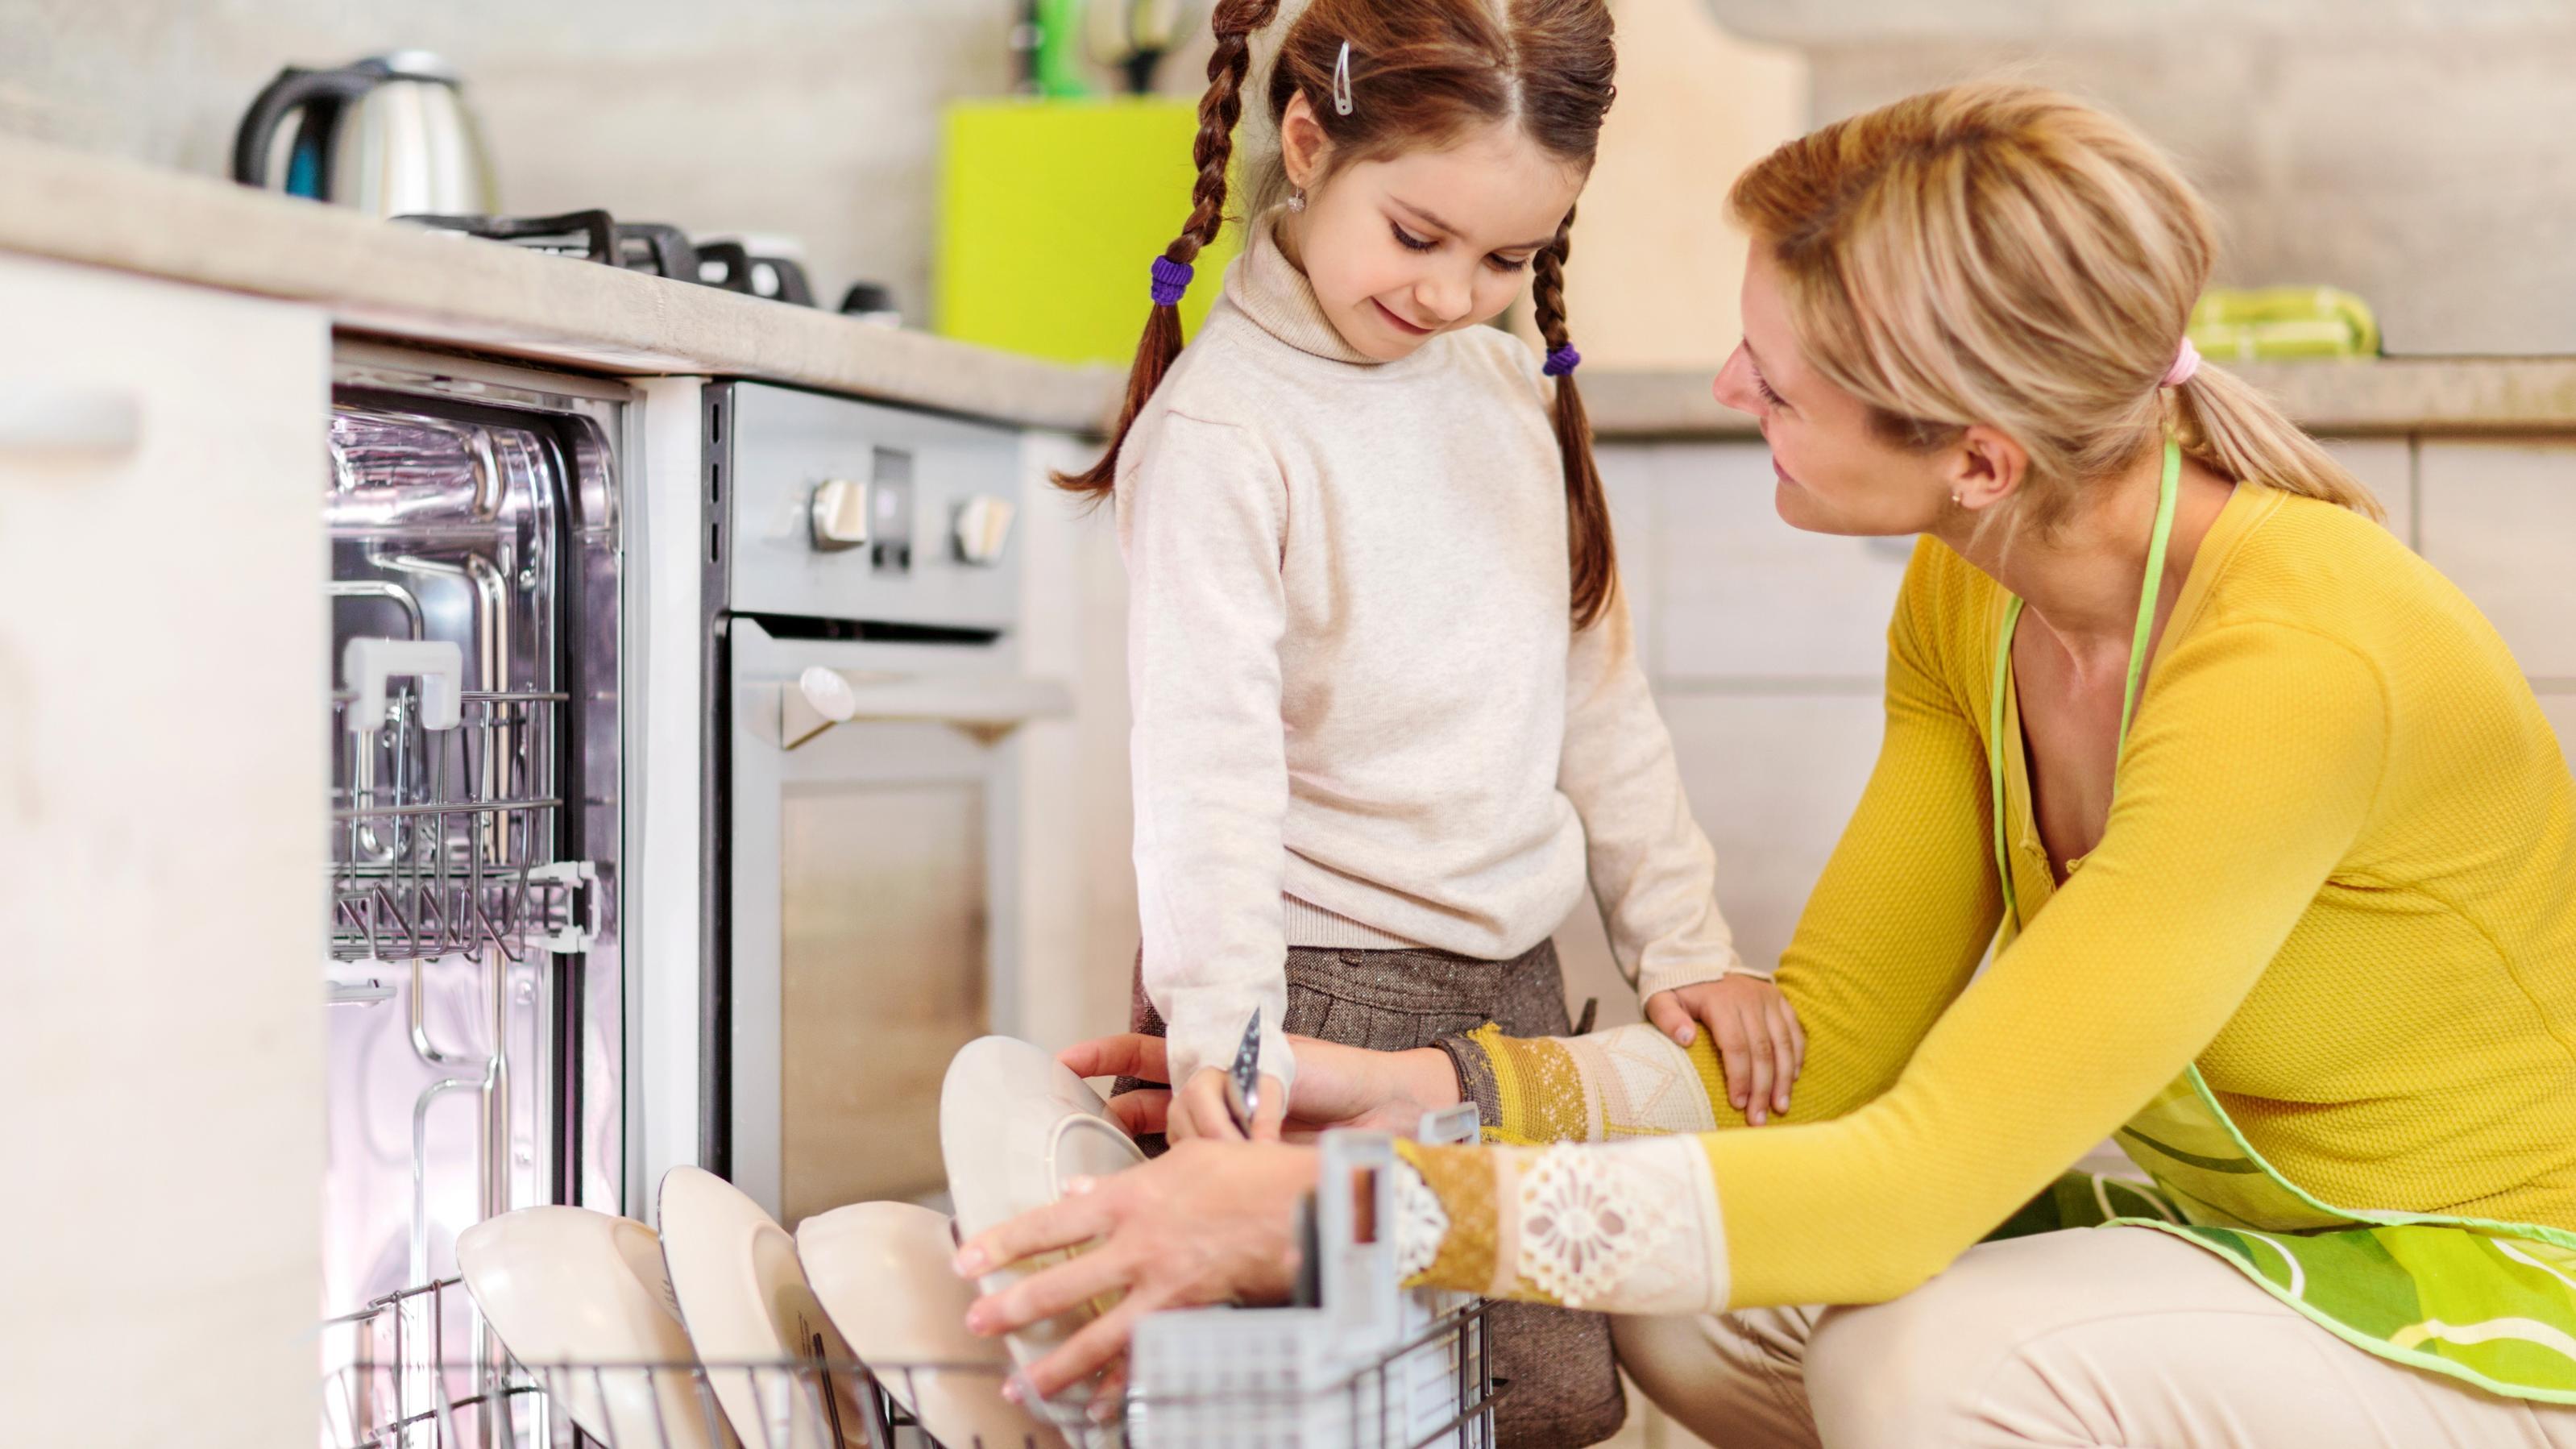 studie zeigt kinder helfen immer weniger im haushalt mit. Black Bedroom Furniture Sets. Home Design Ideas